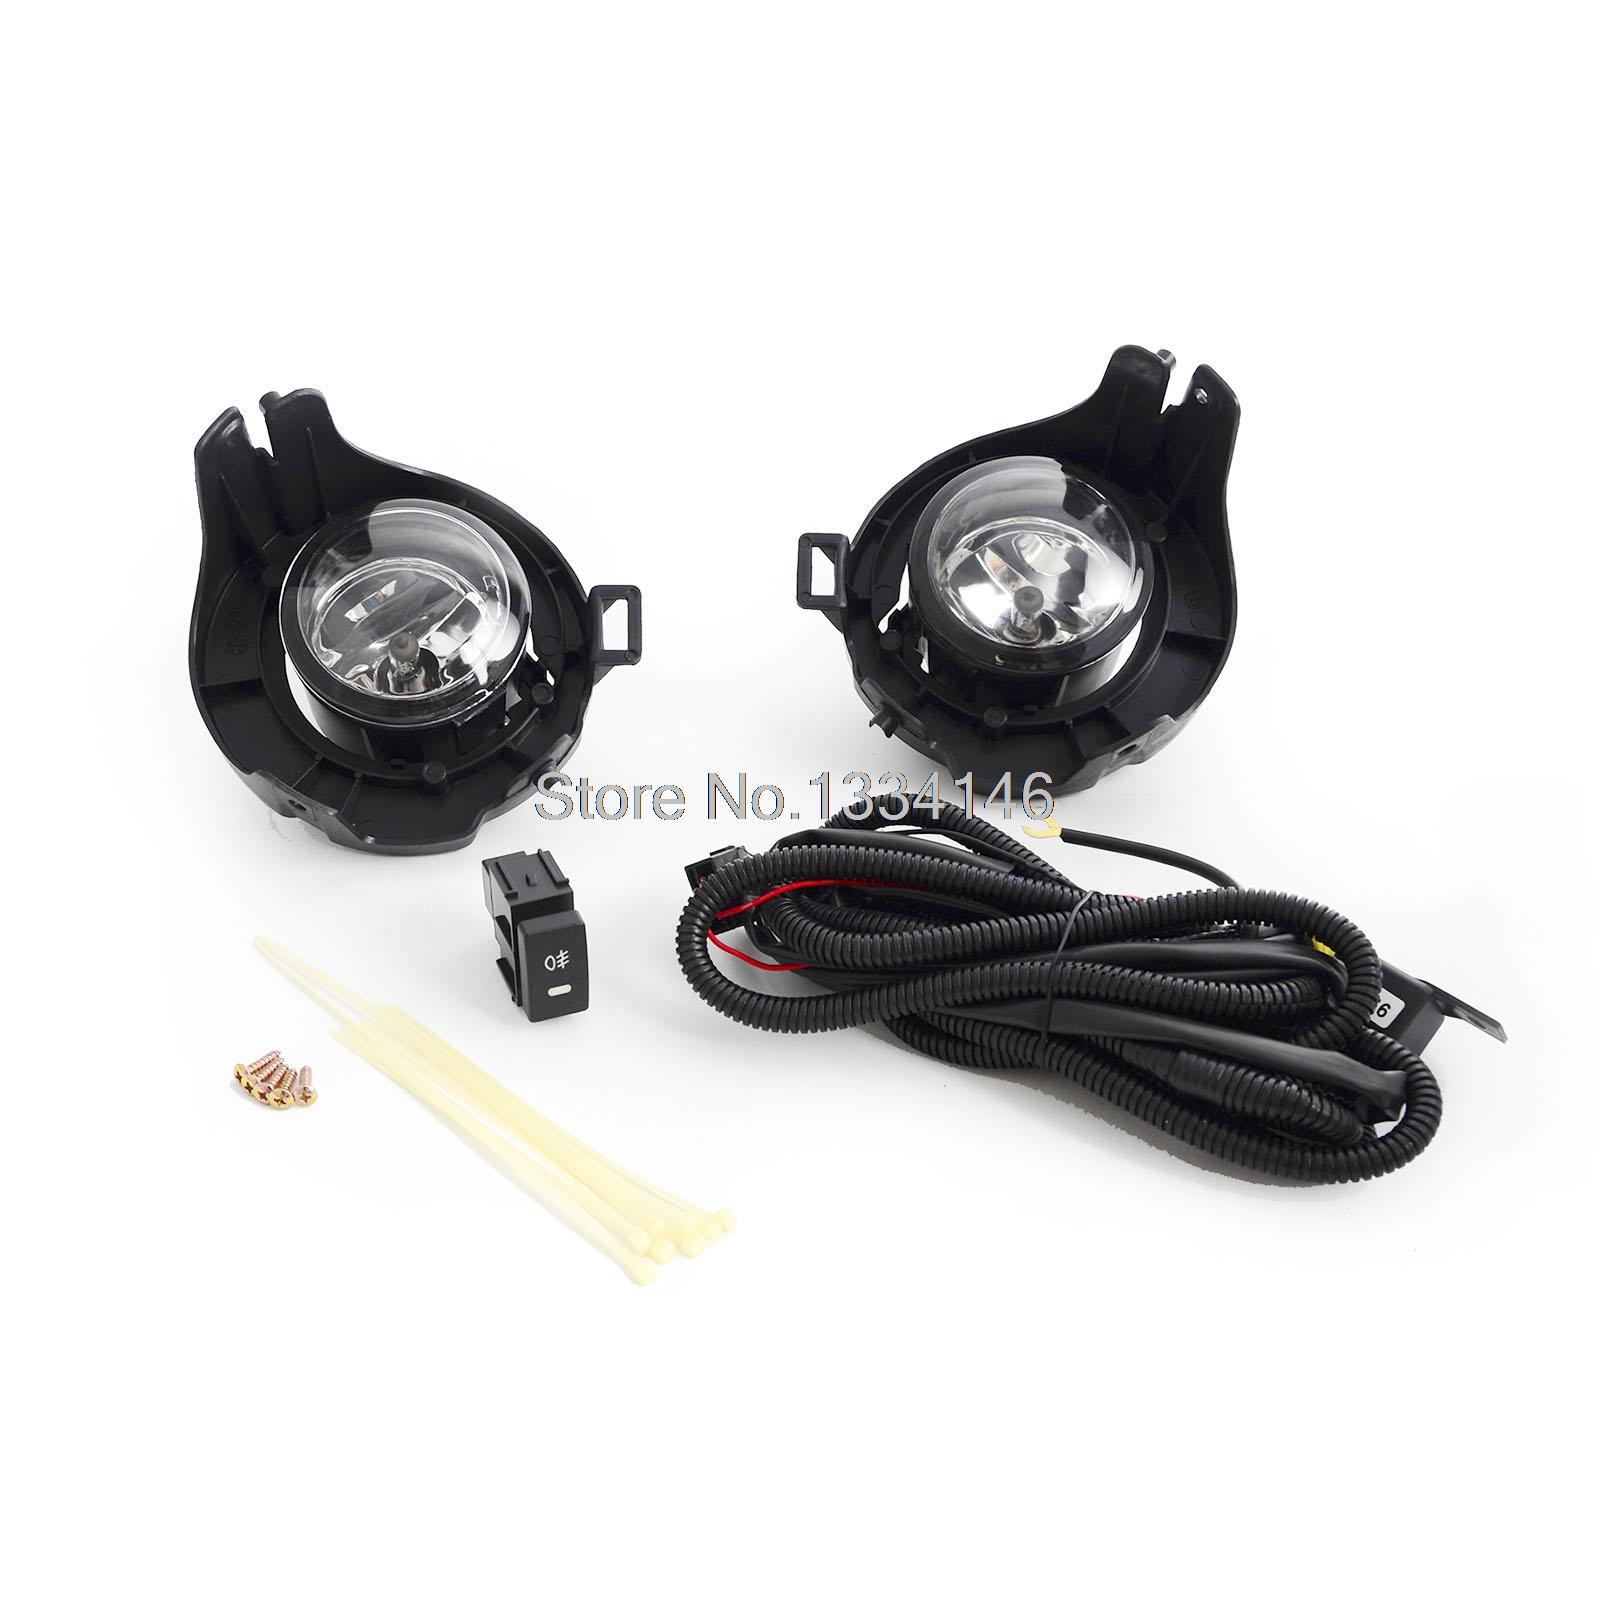 For Nissan NAVARA D40 Driving Fog Lights Lamps Complete Kit 2005 2014